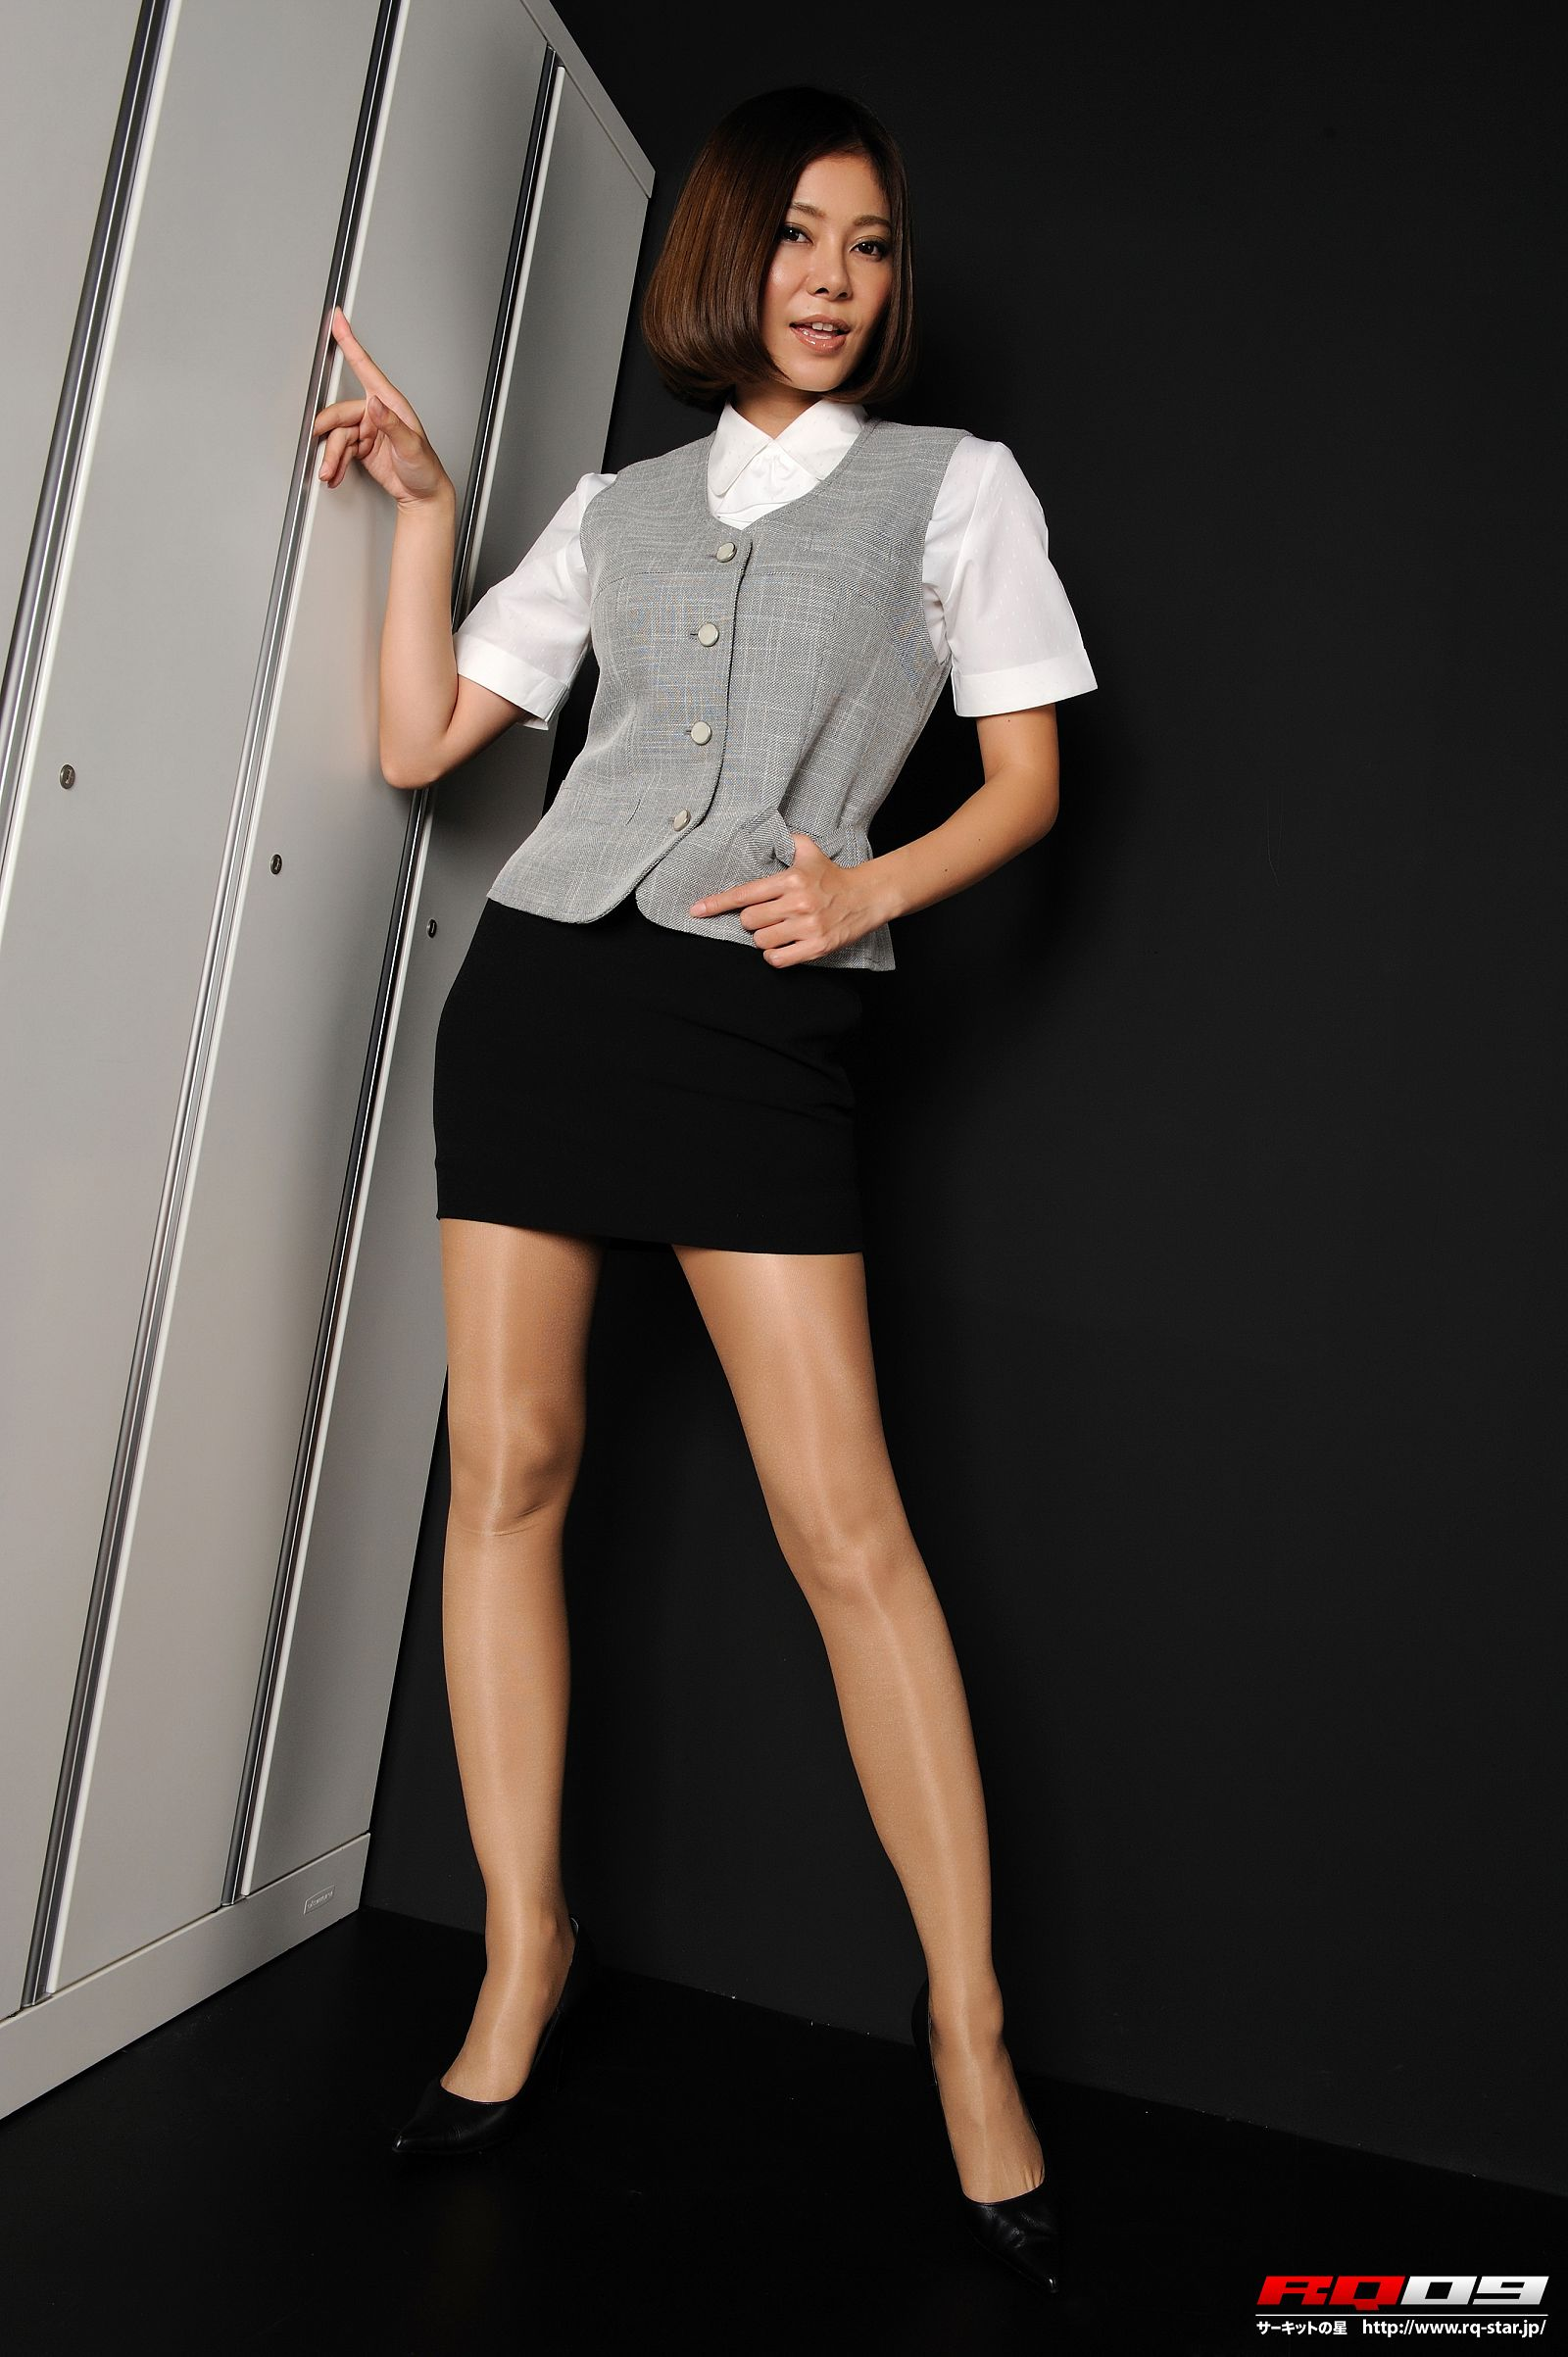 [RQ STAR美女] NO.0223 Erika Mostardini モスタルディーニエリカ Office Lady[110P] RQ STAR 第1张